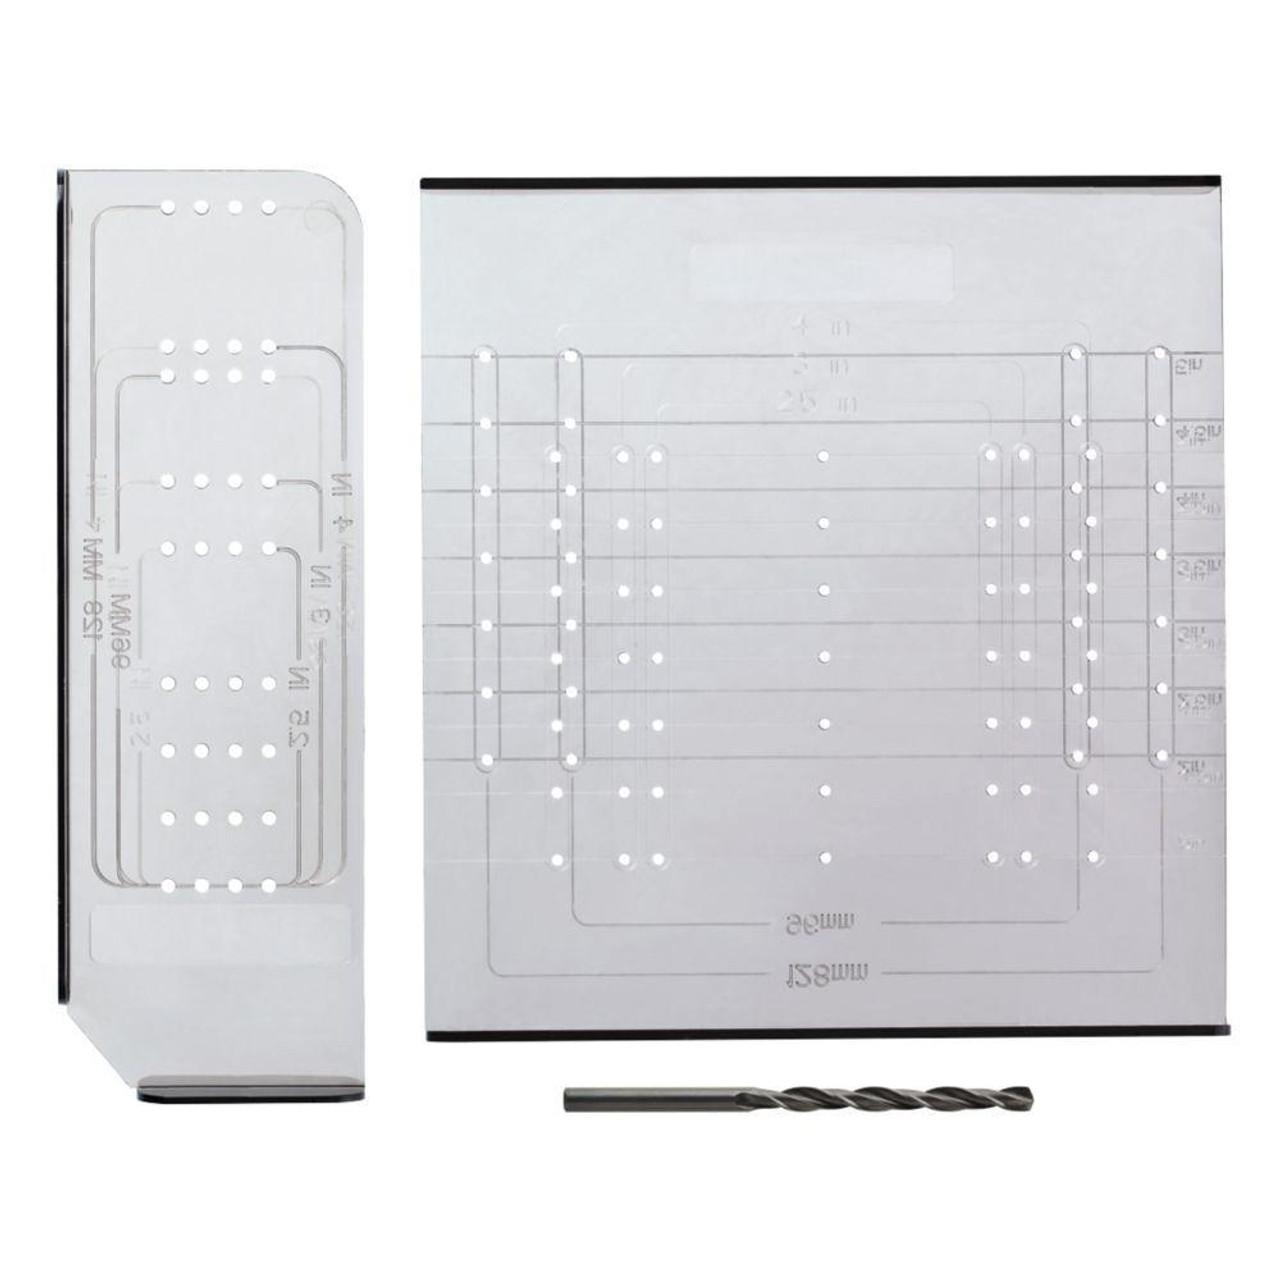 ANO251C-CL Align Right Cabinet Hardware Installation Template Set w/ Drill Bit